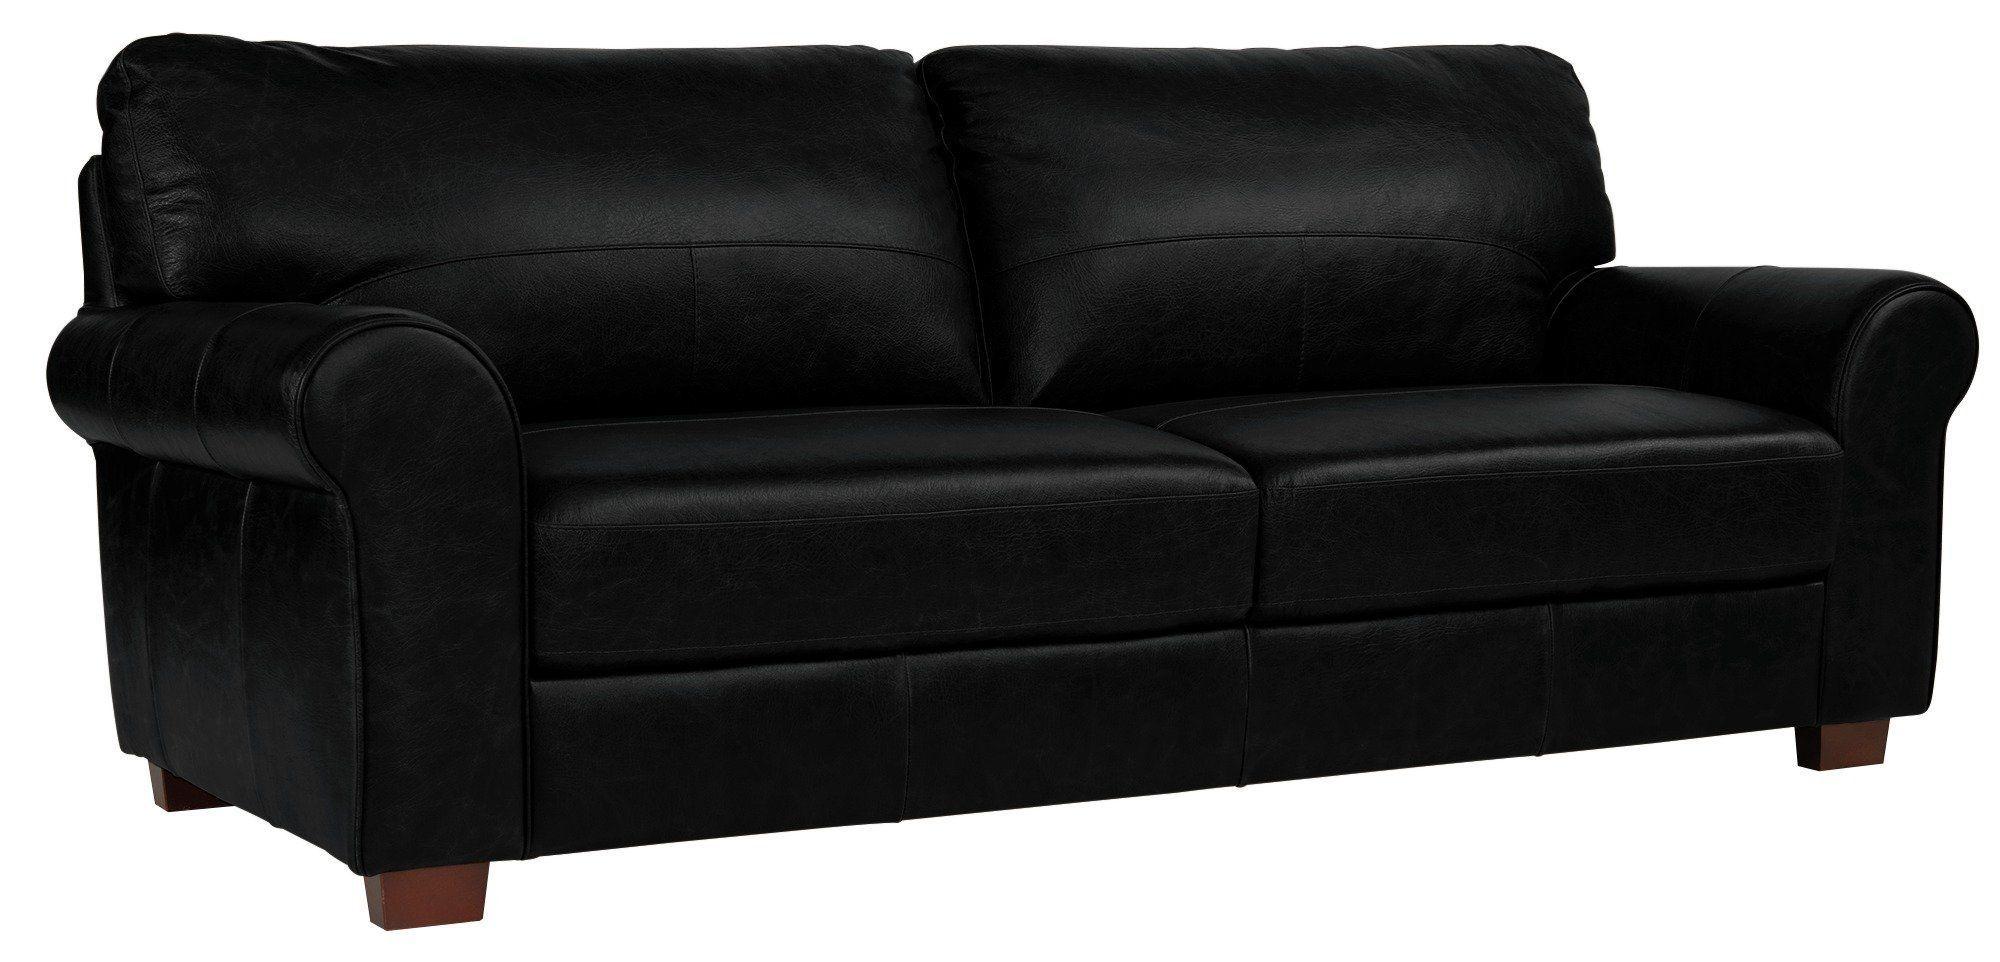 Pin On Sofa Cushions